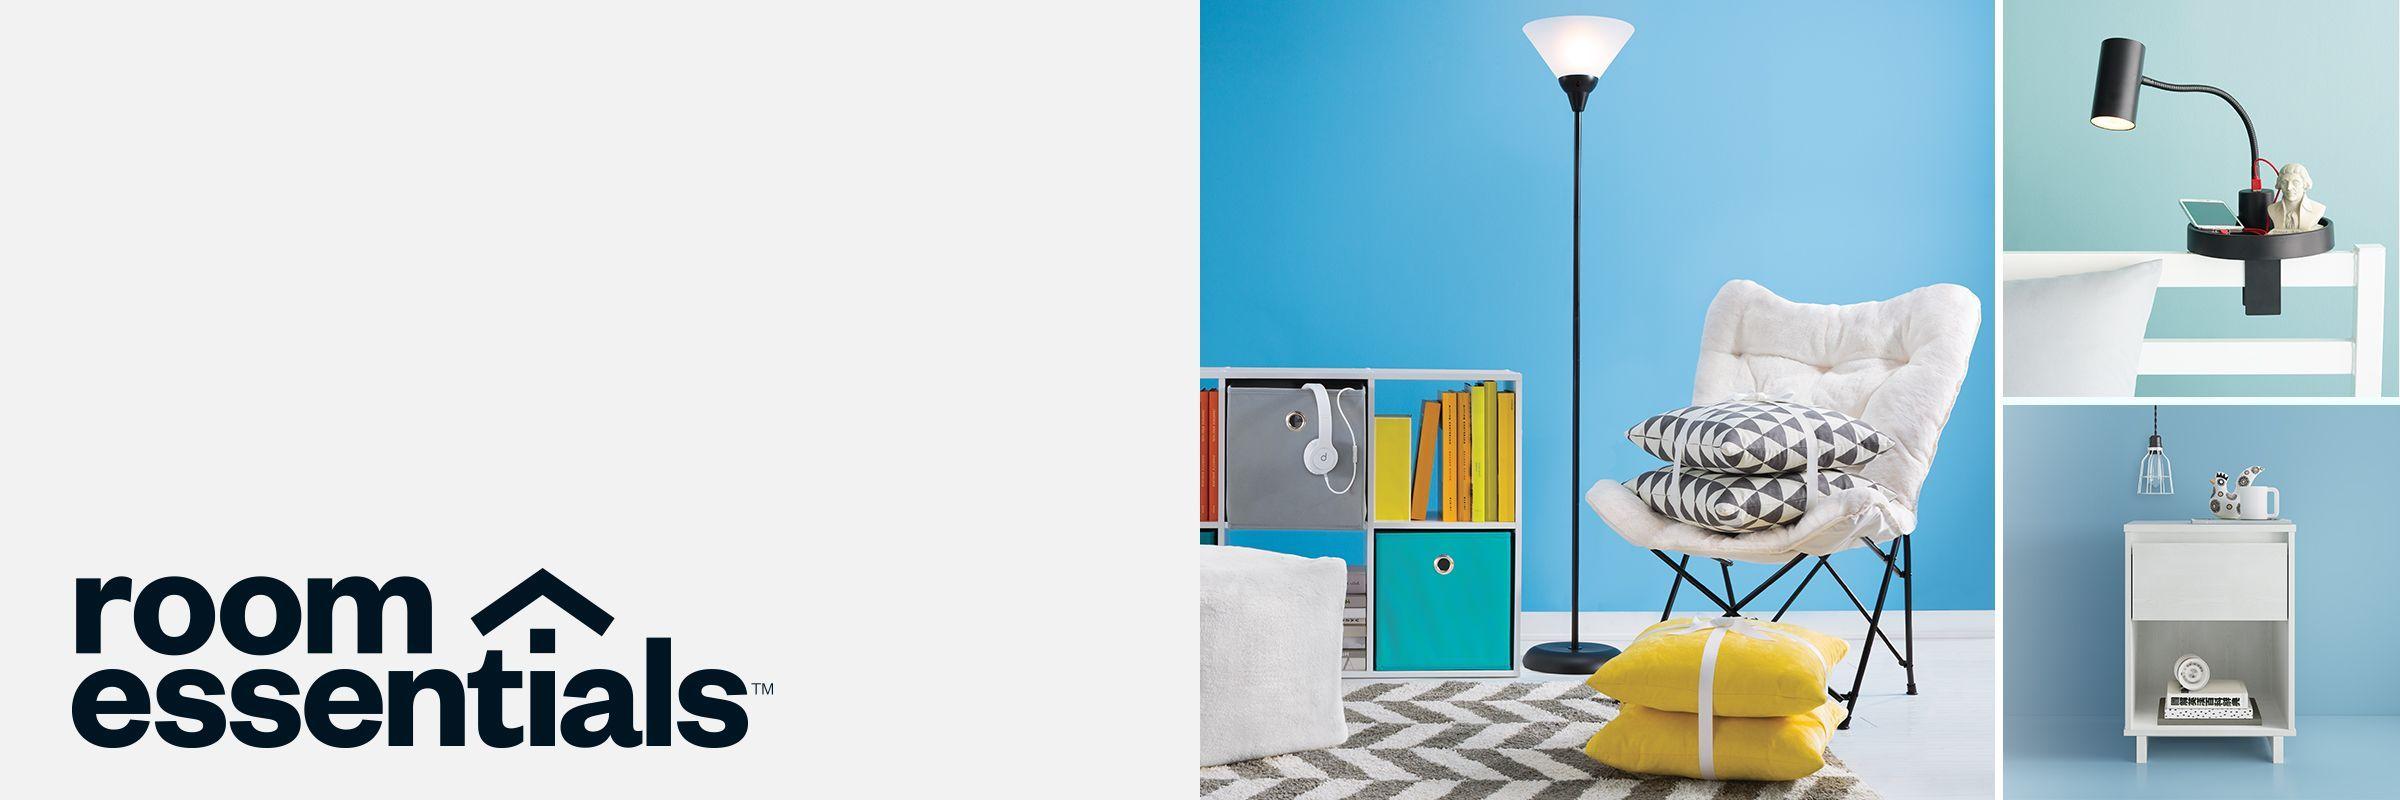 Pin by Staples Design on Target (Furniture) | Pinterest | Target ...